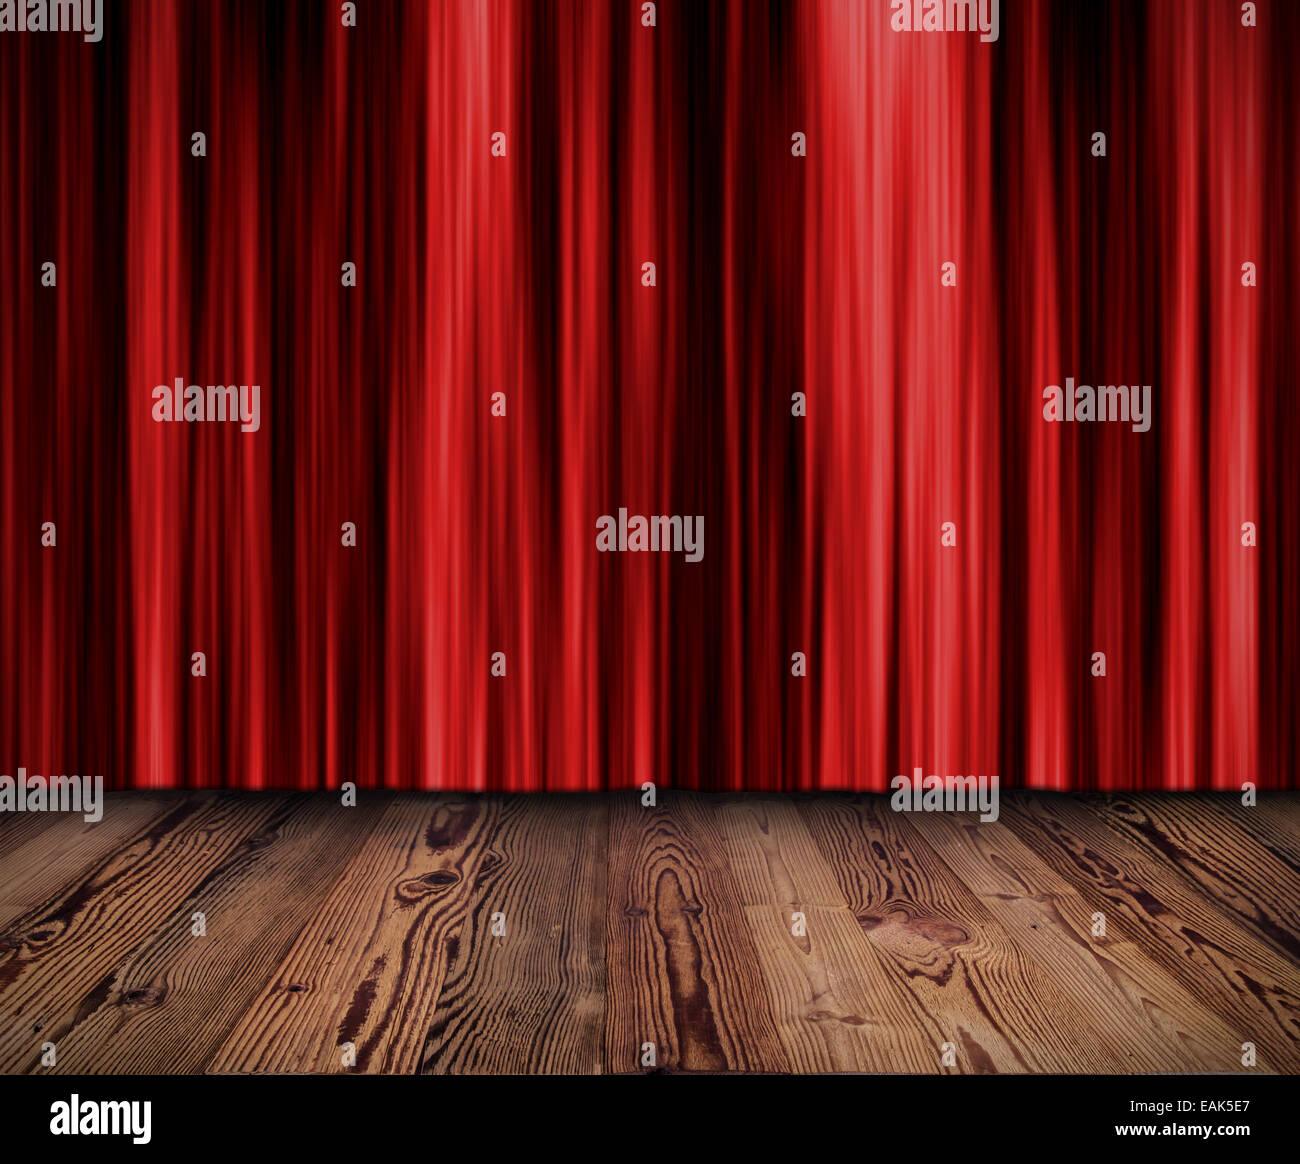 red curtain cinema